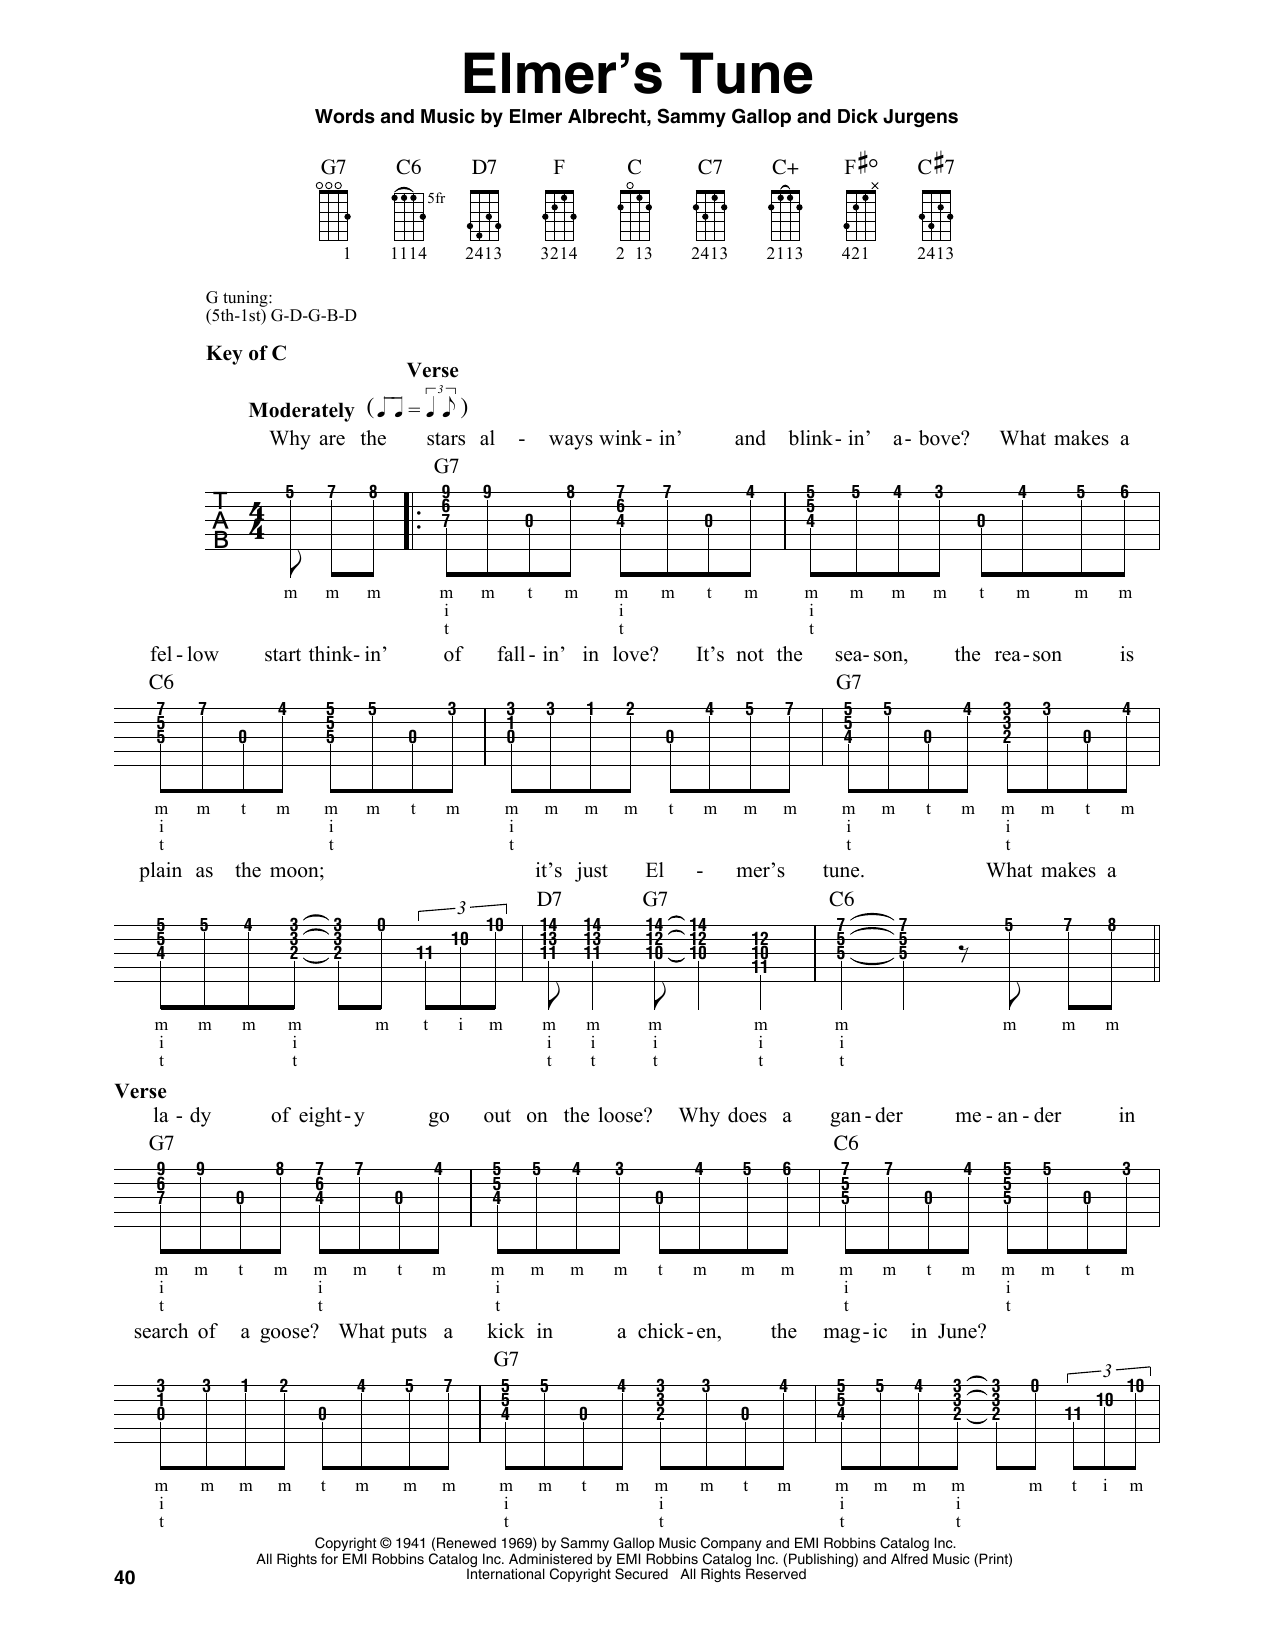 Elmer's Tune (Banjo Tab)